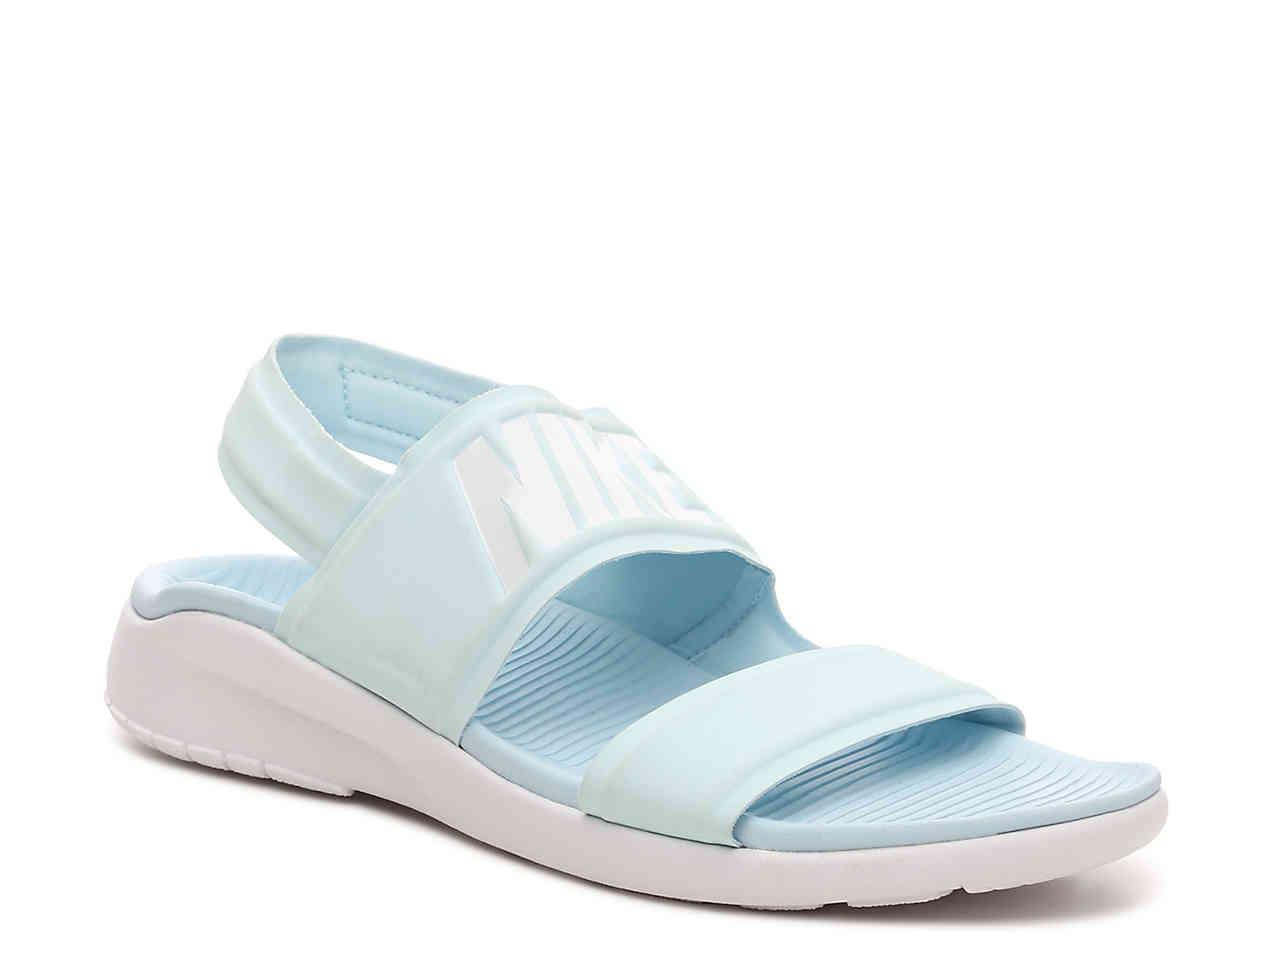 c14a17d99086 Lyst - Nike Tanjun Sport Sandal in Blue